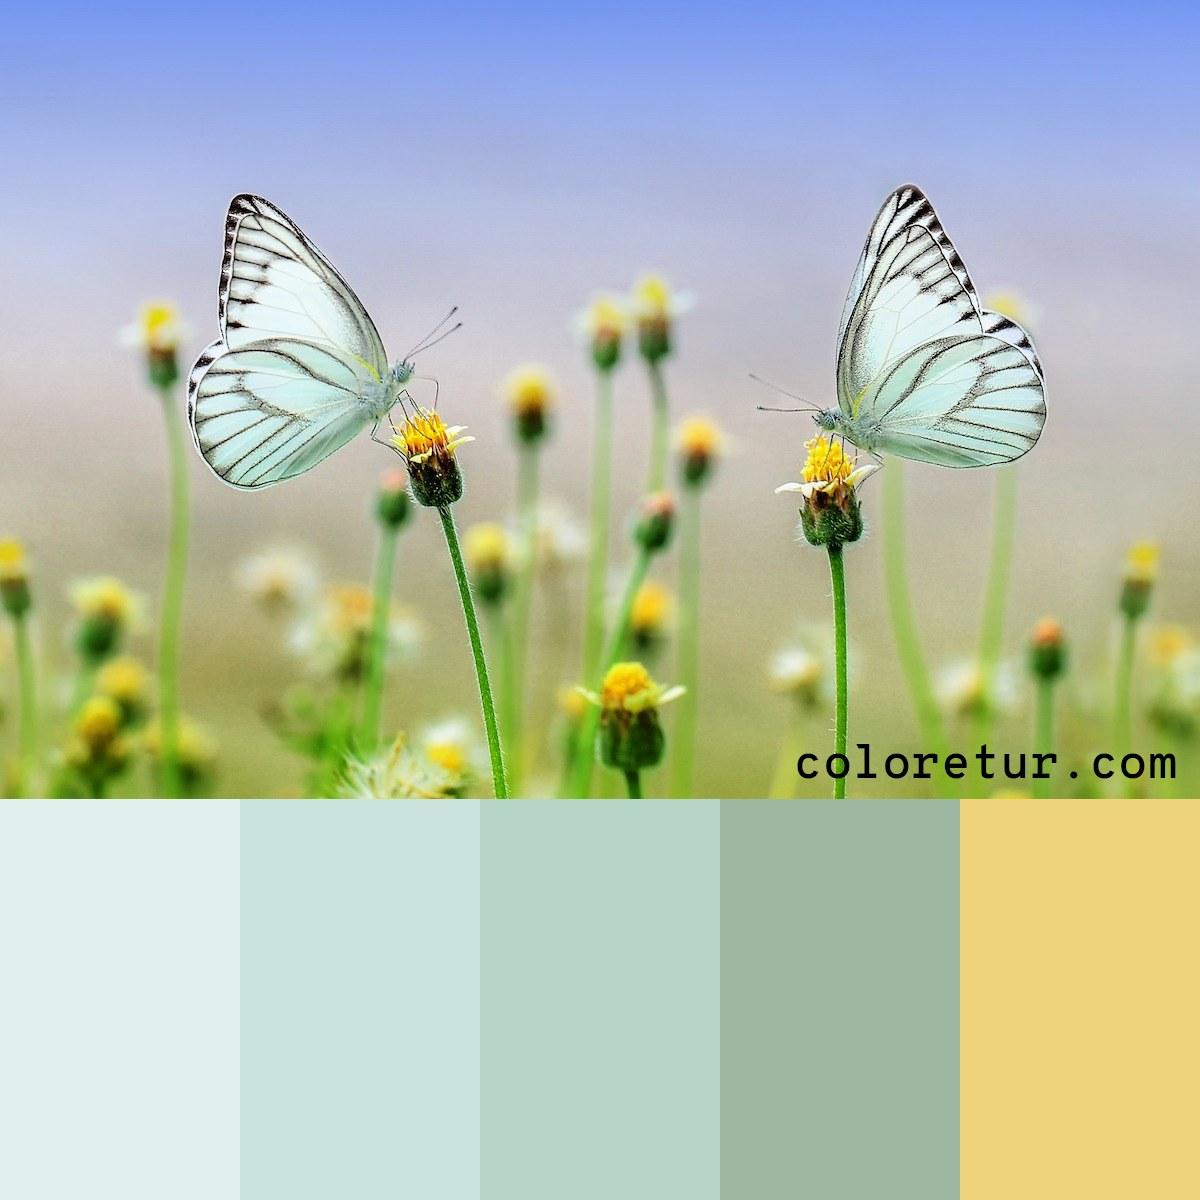 Translucent butterflies make for an elegant, whimsical palette.